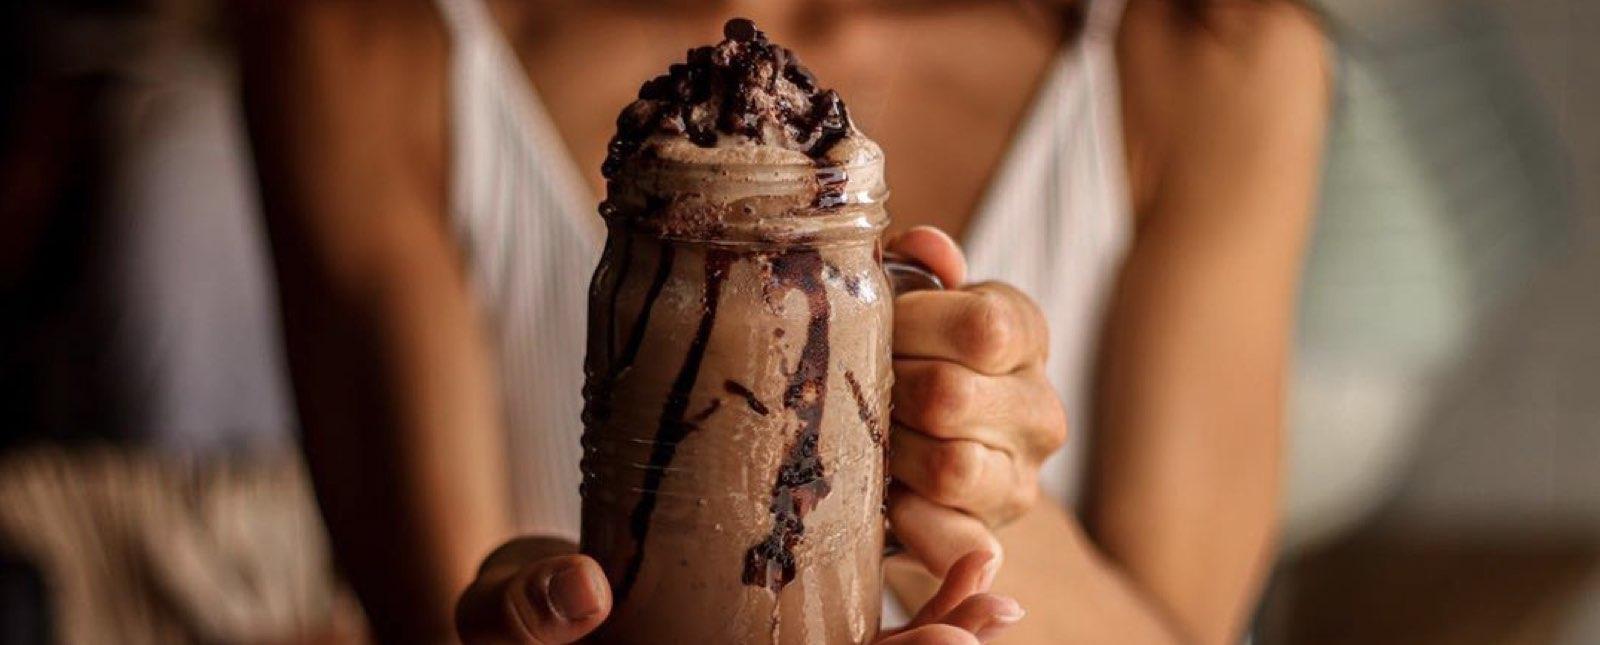 receta-de-frappe-de-chocolate-con-vino-tinto-en-5-minutos